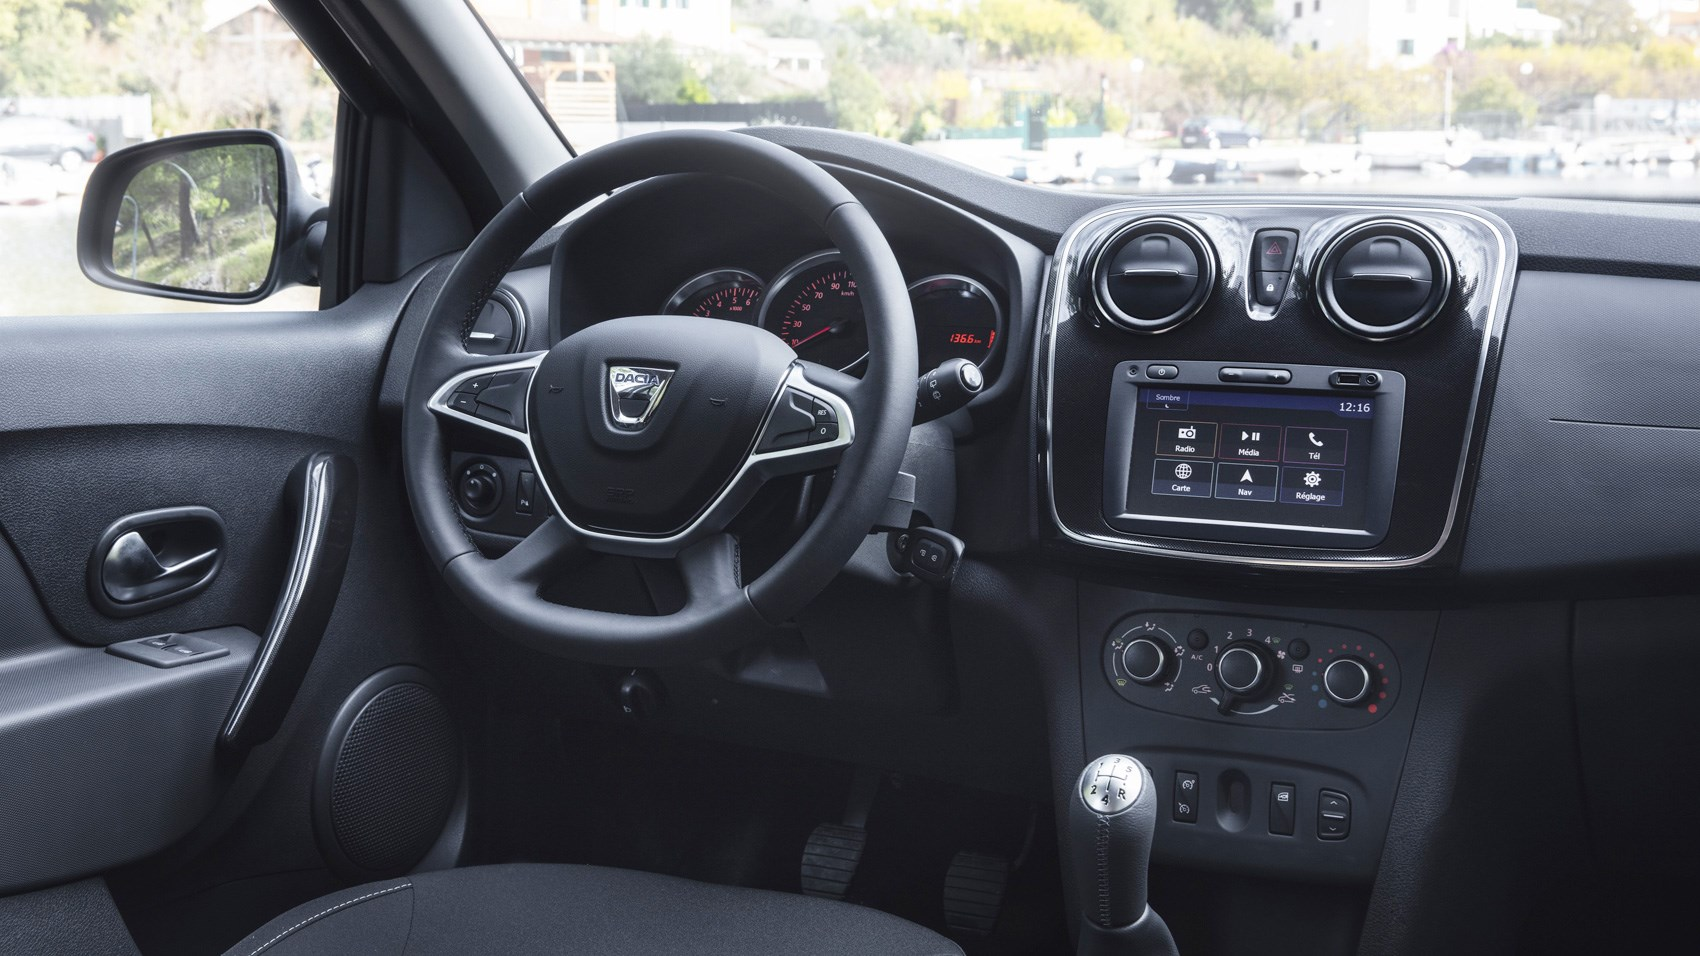 Dacia Logan Mcv Ambiance Dci 90 2017 Review Car Magazine